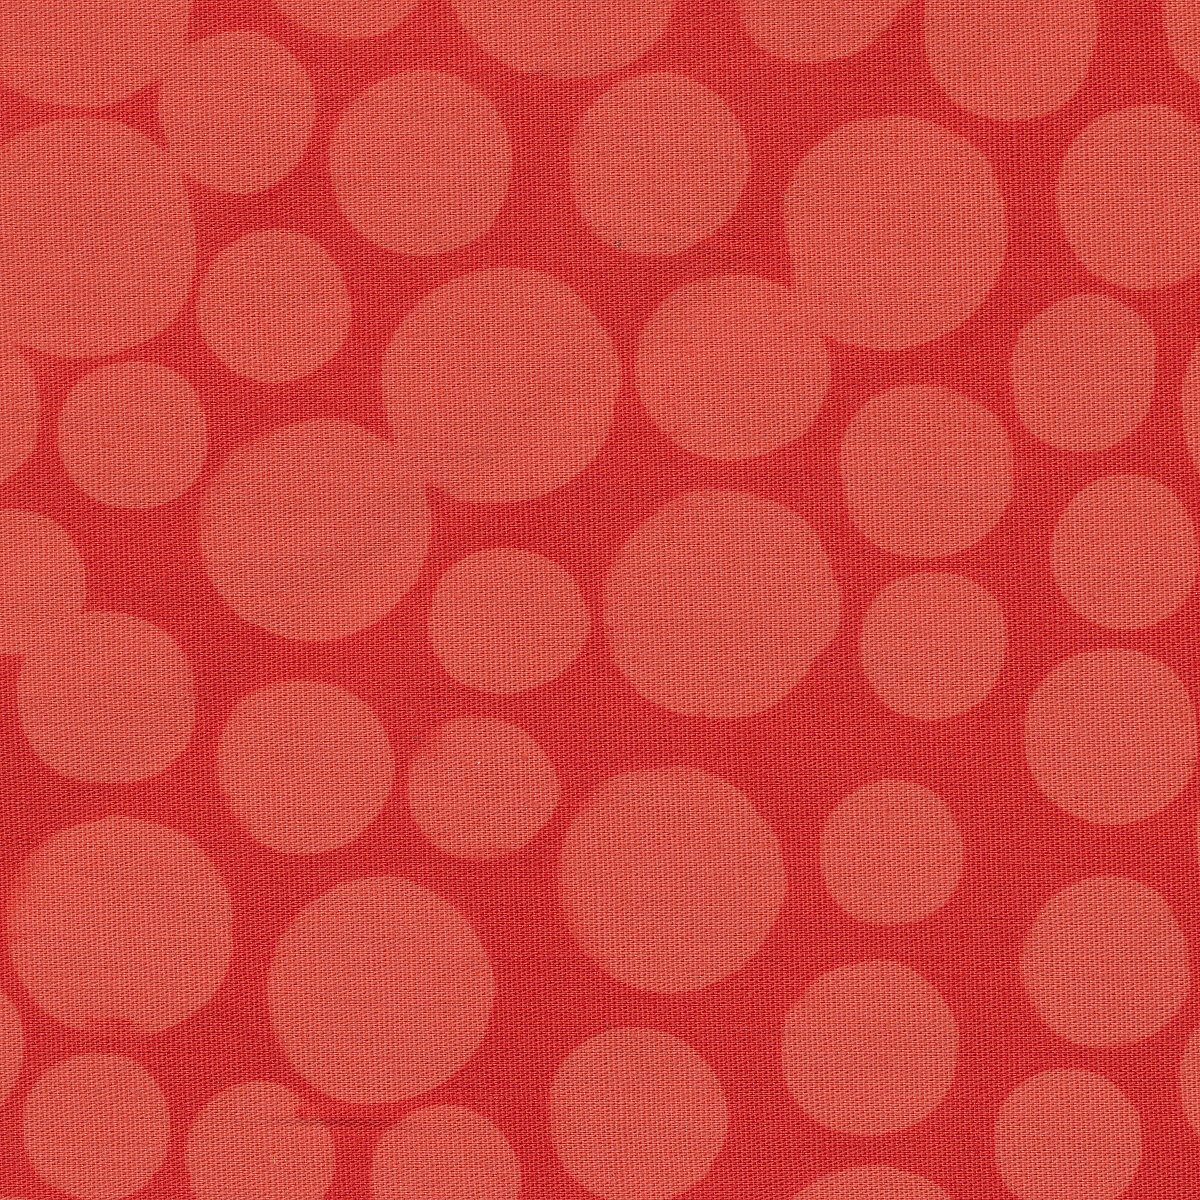 Indah Hand Dyed Batiks - 2161-59